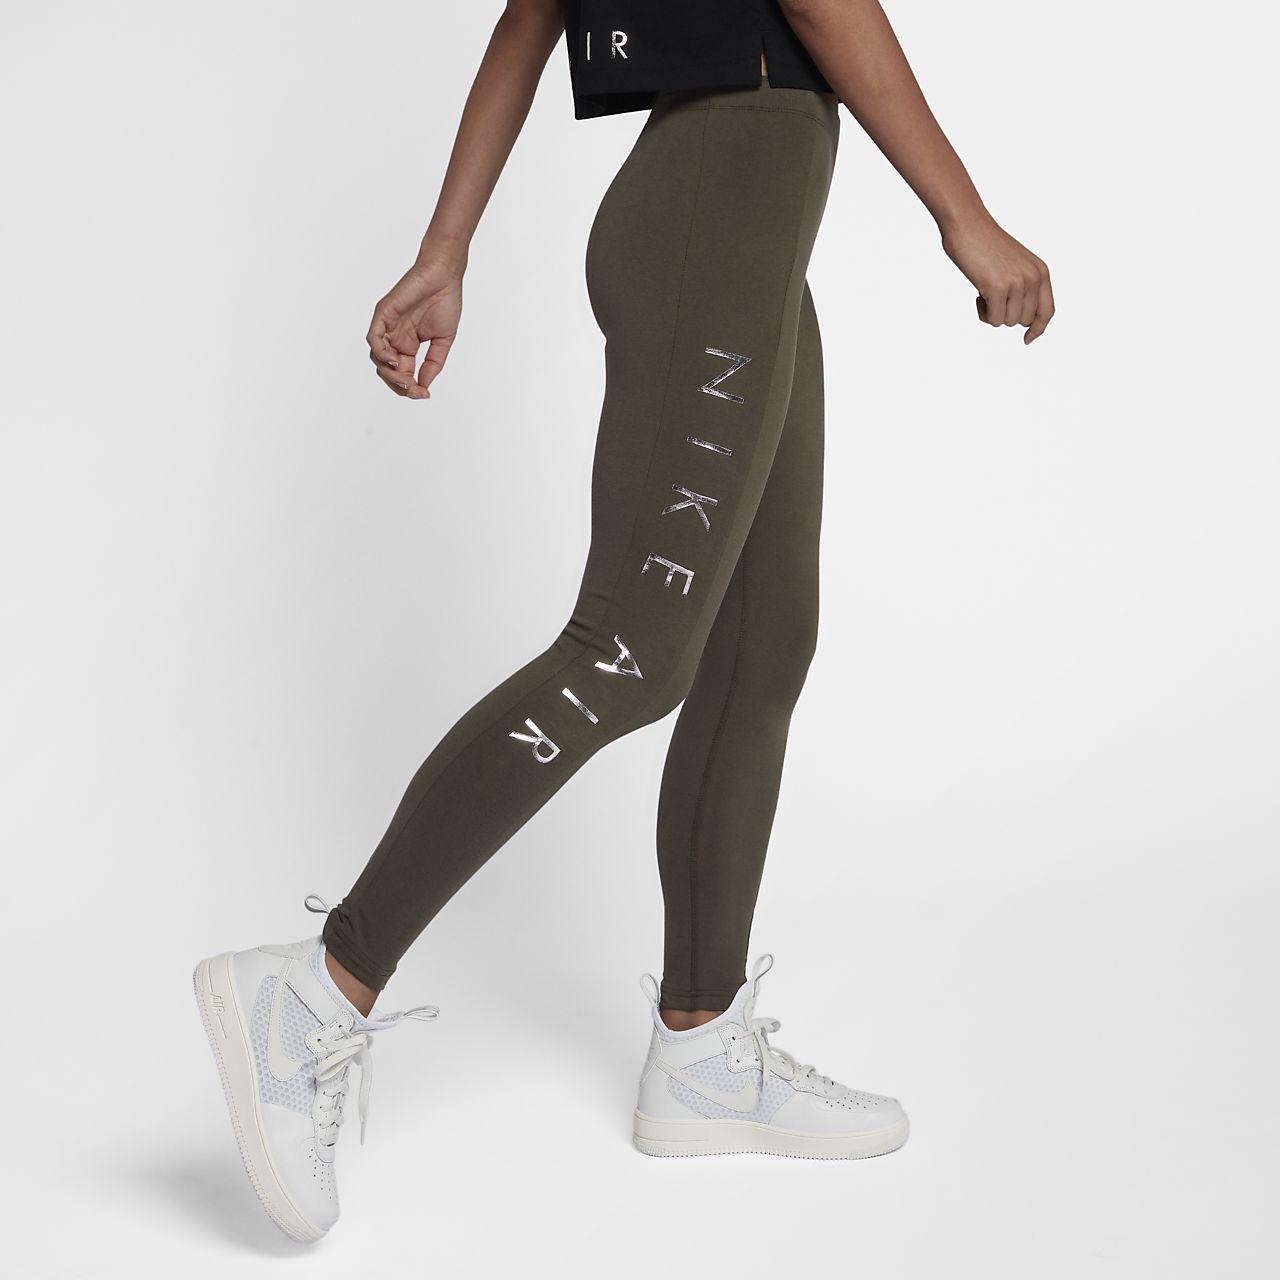 Tight Vetements Wear Air Pour Nike Sportswear FemmeActive xtsrdhQC